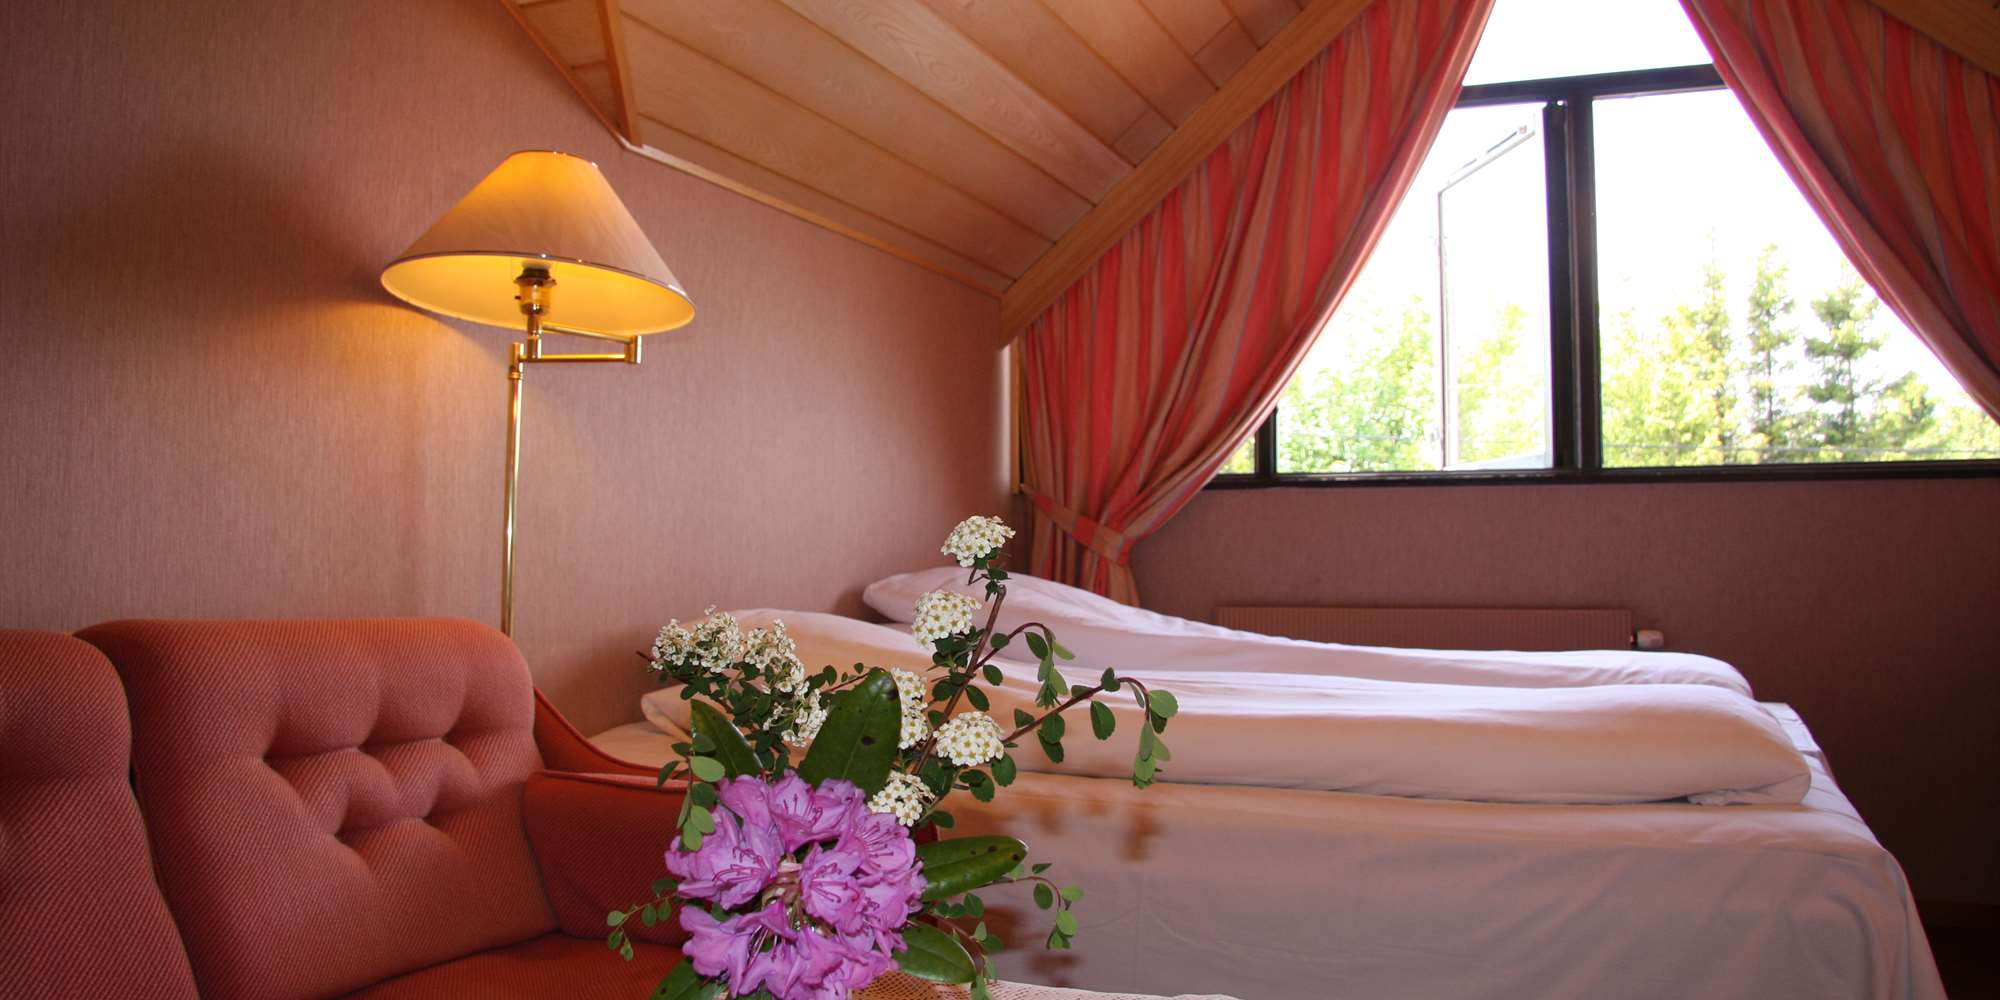 Alver Hotel - Dobbeltrom